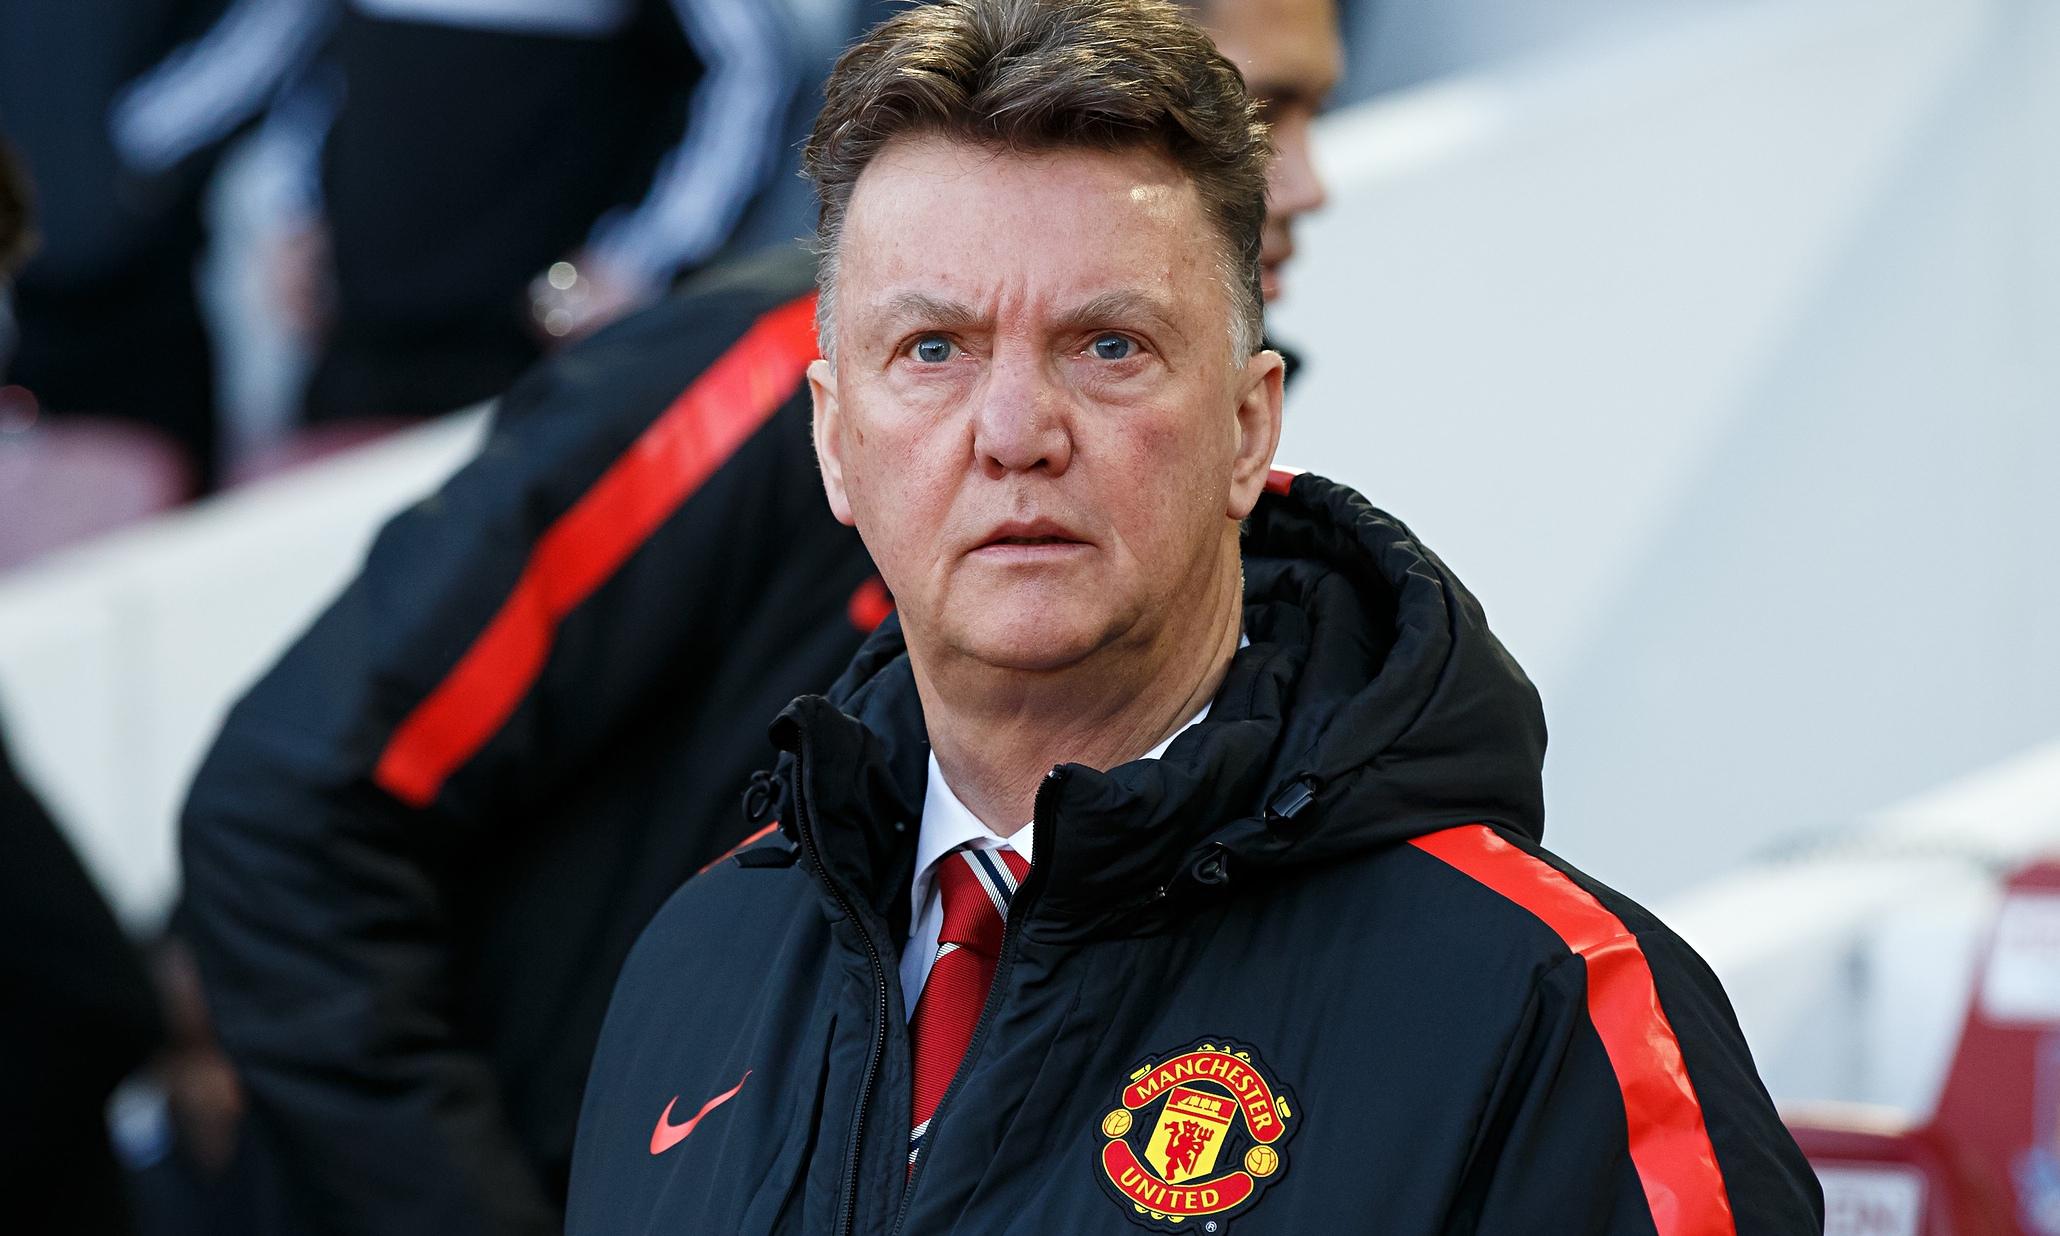 Van Gaal, a un paso de la destitución del Manchester United